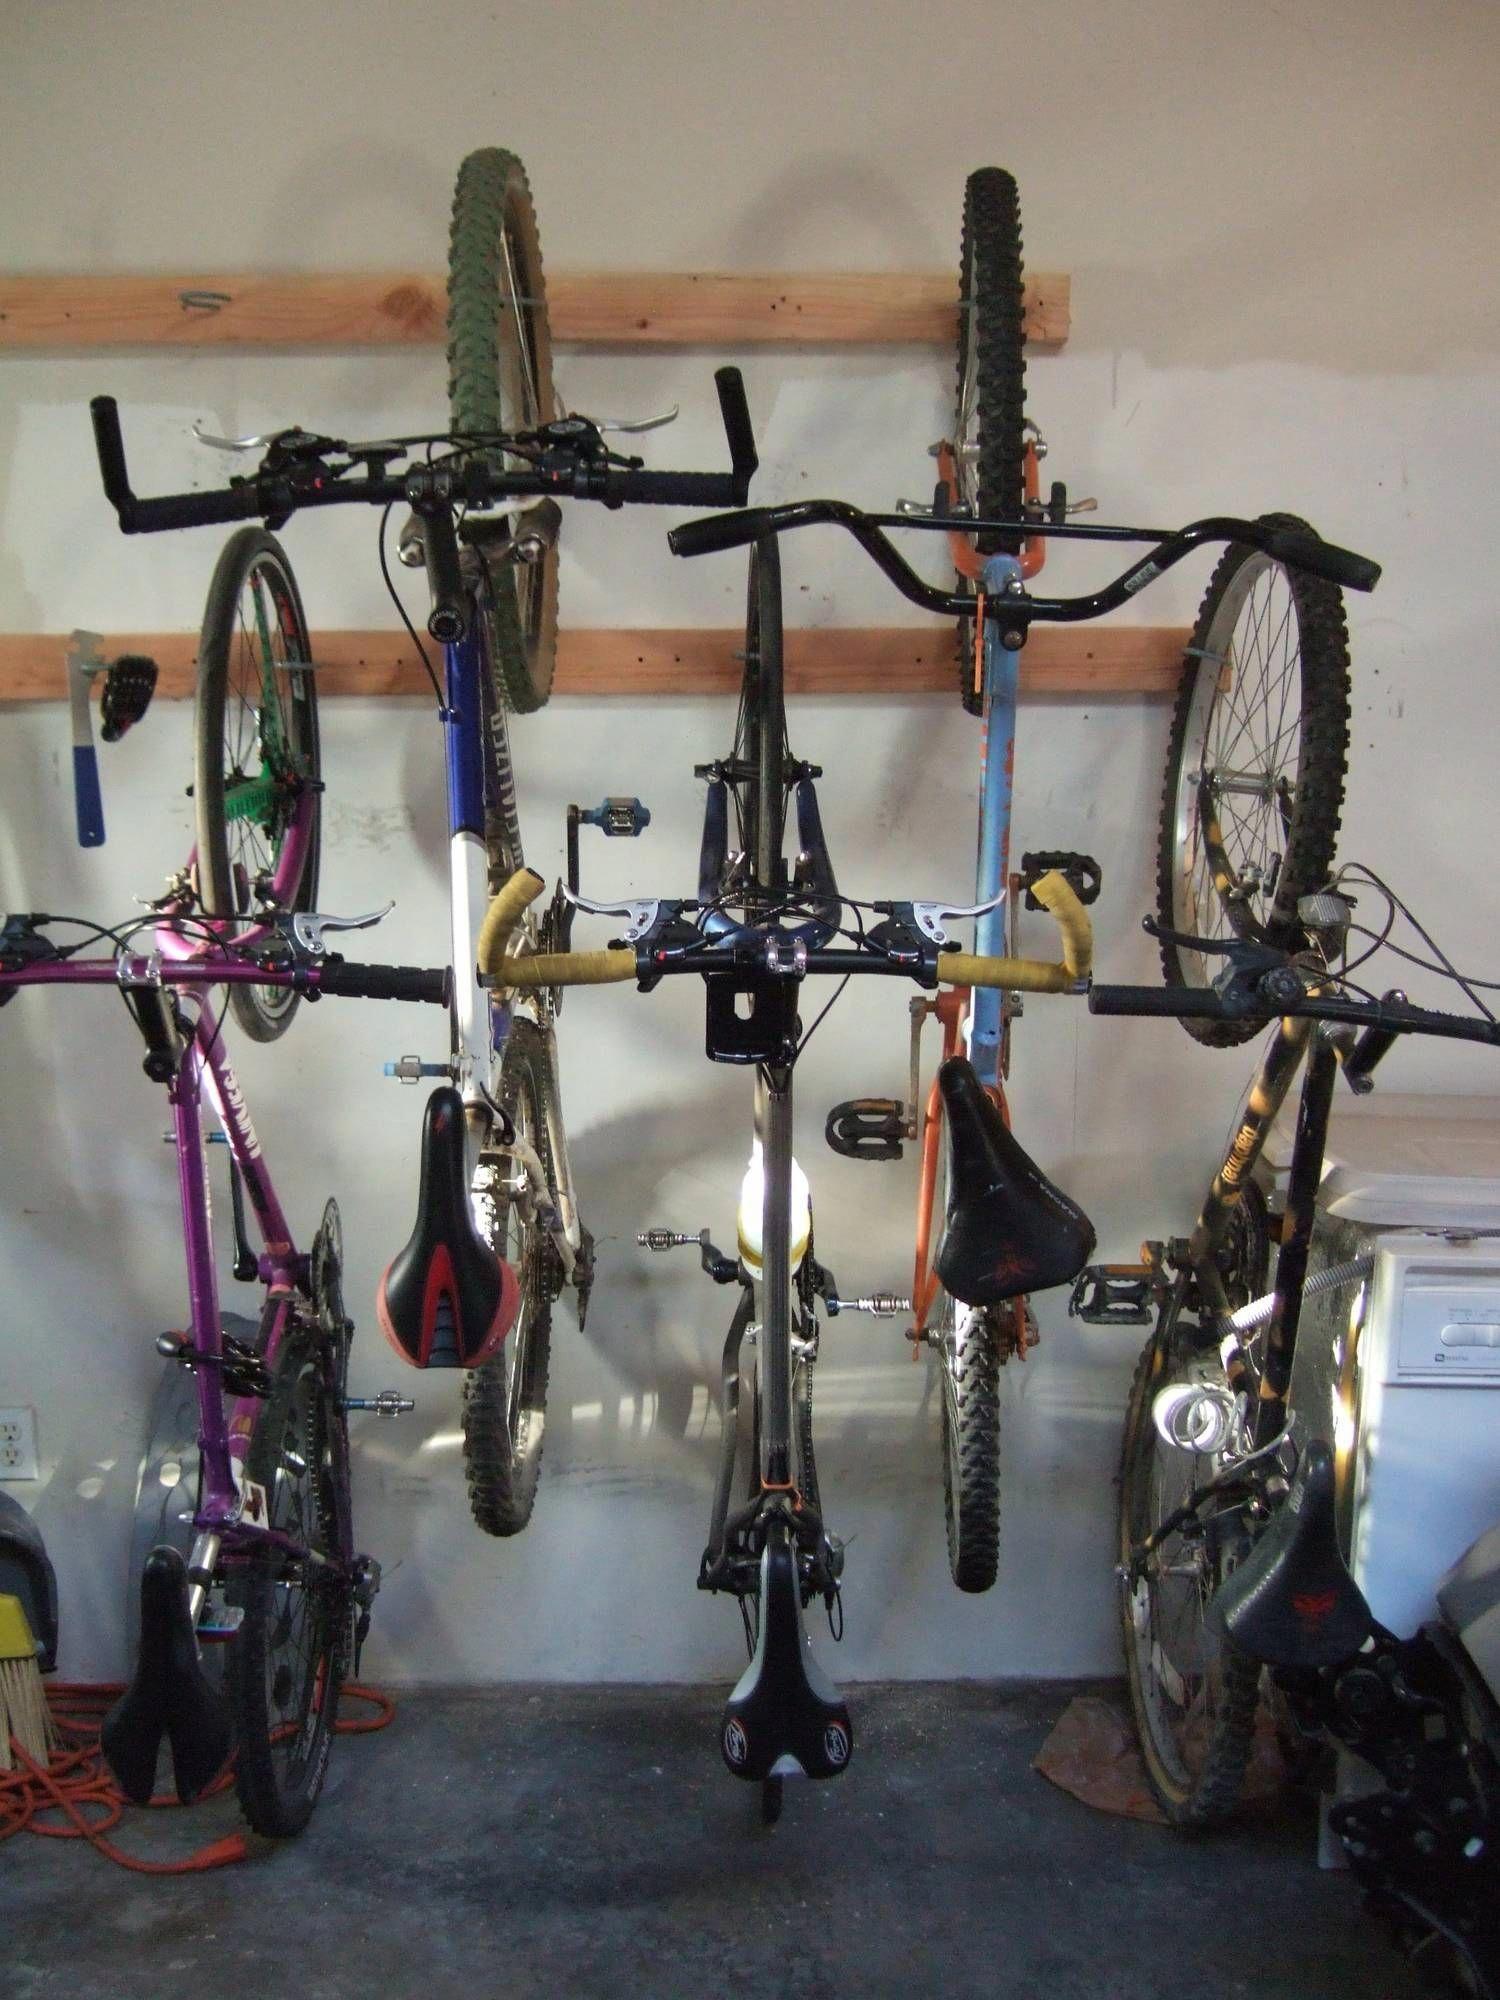 Biker Aesthetic Bike Rim Bike Storage Solutions Jeep Wrangler Fenders Vertical Bike Storage Hanging Bike Rack Bike Storage Rack